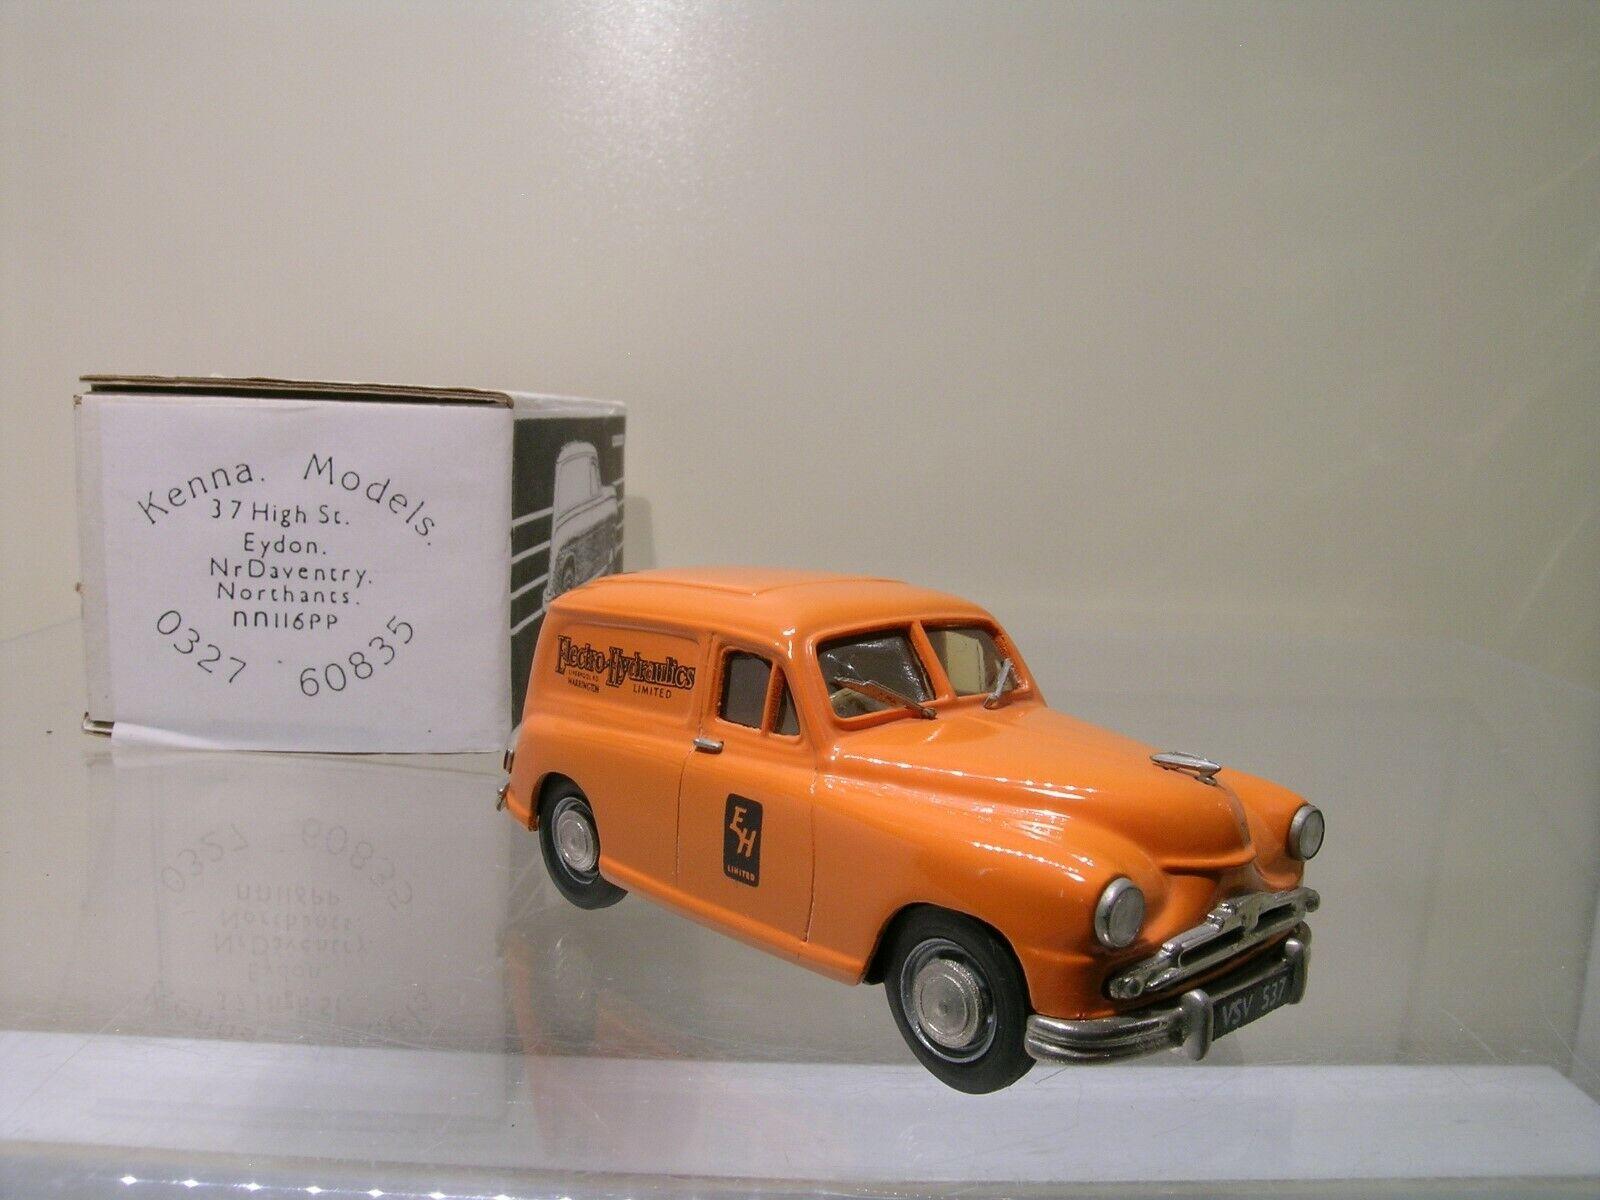 KENNA MODELS STANDARD VANGUARD VAN PHASE 2 ELECTRO HYDR.12 150 orange 1953 1 43